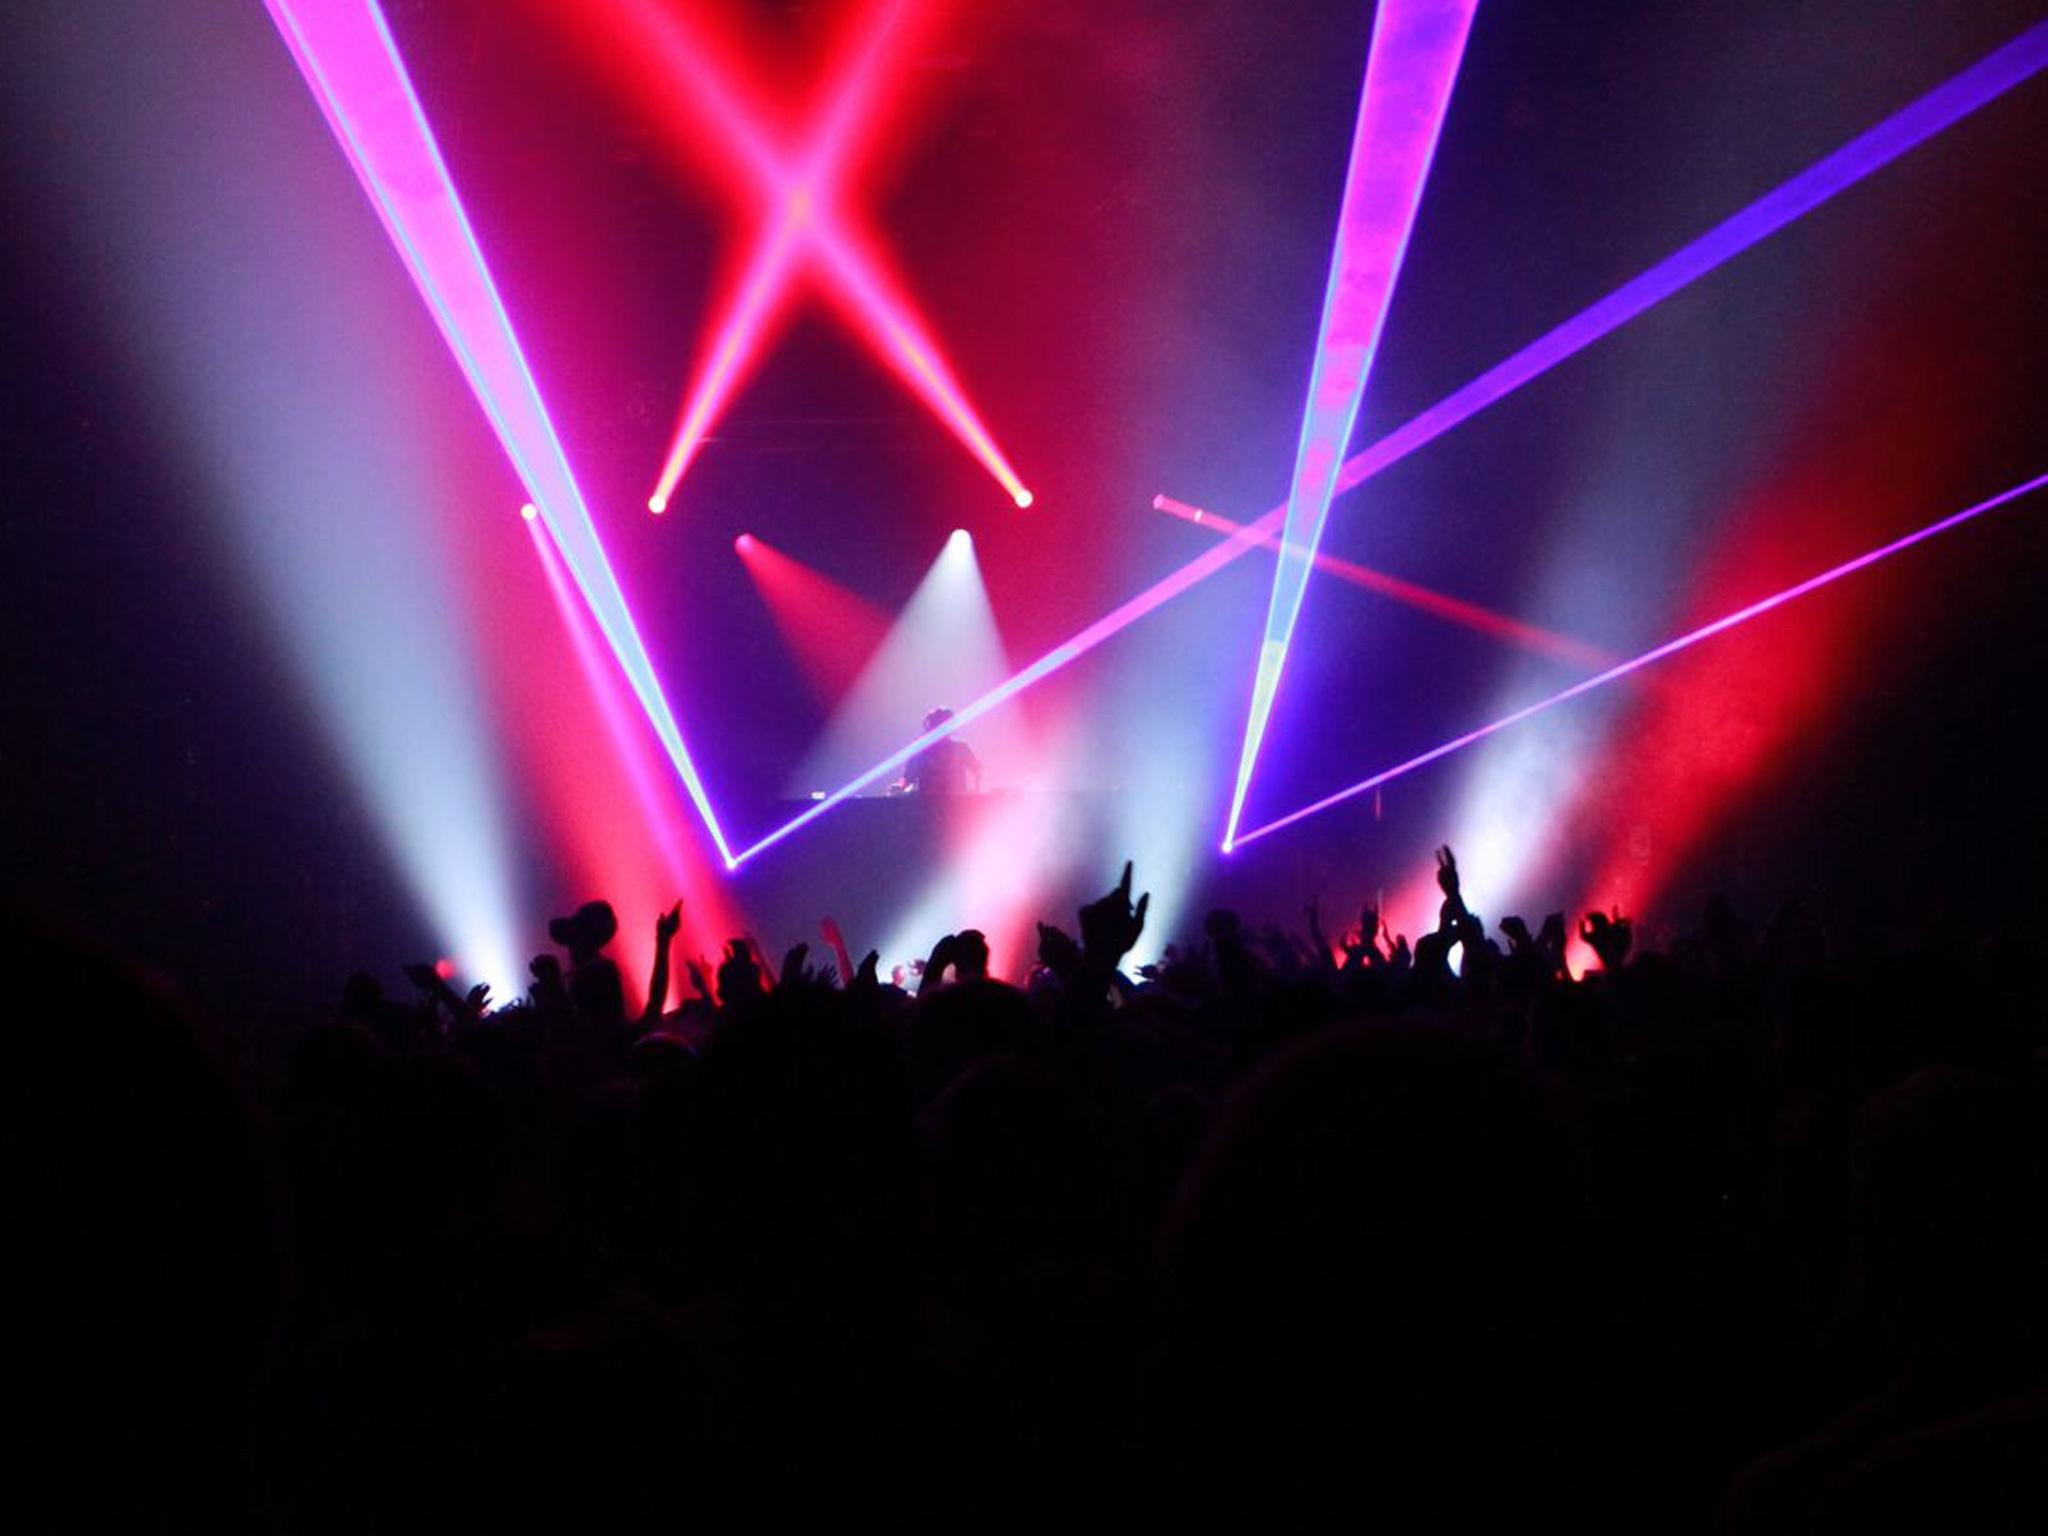 Ten reasons to go to a music festival in Reykjavik: Sonar festival Iceland